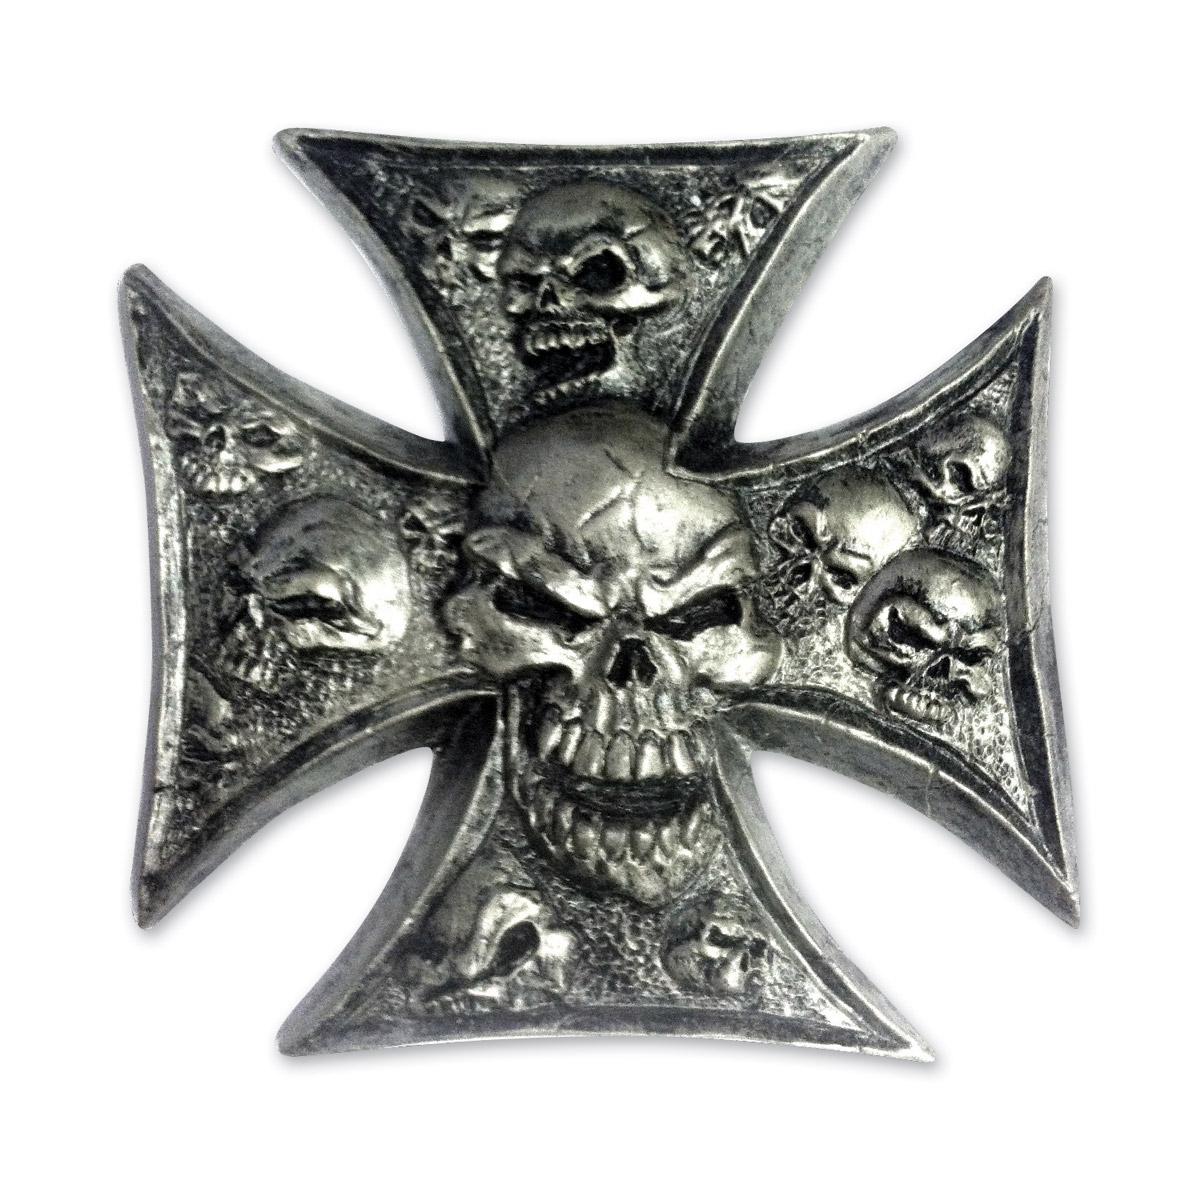 Lethal Threat Iron Cross 3-D Emblem